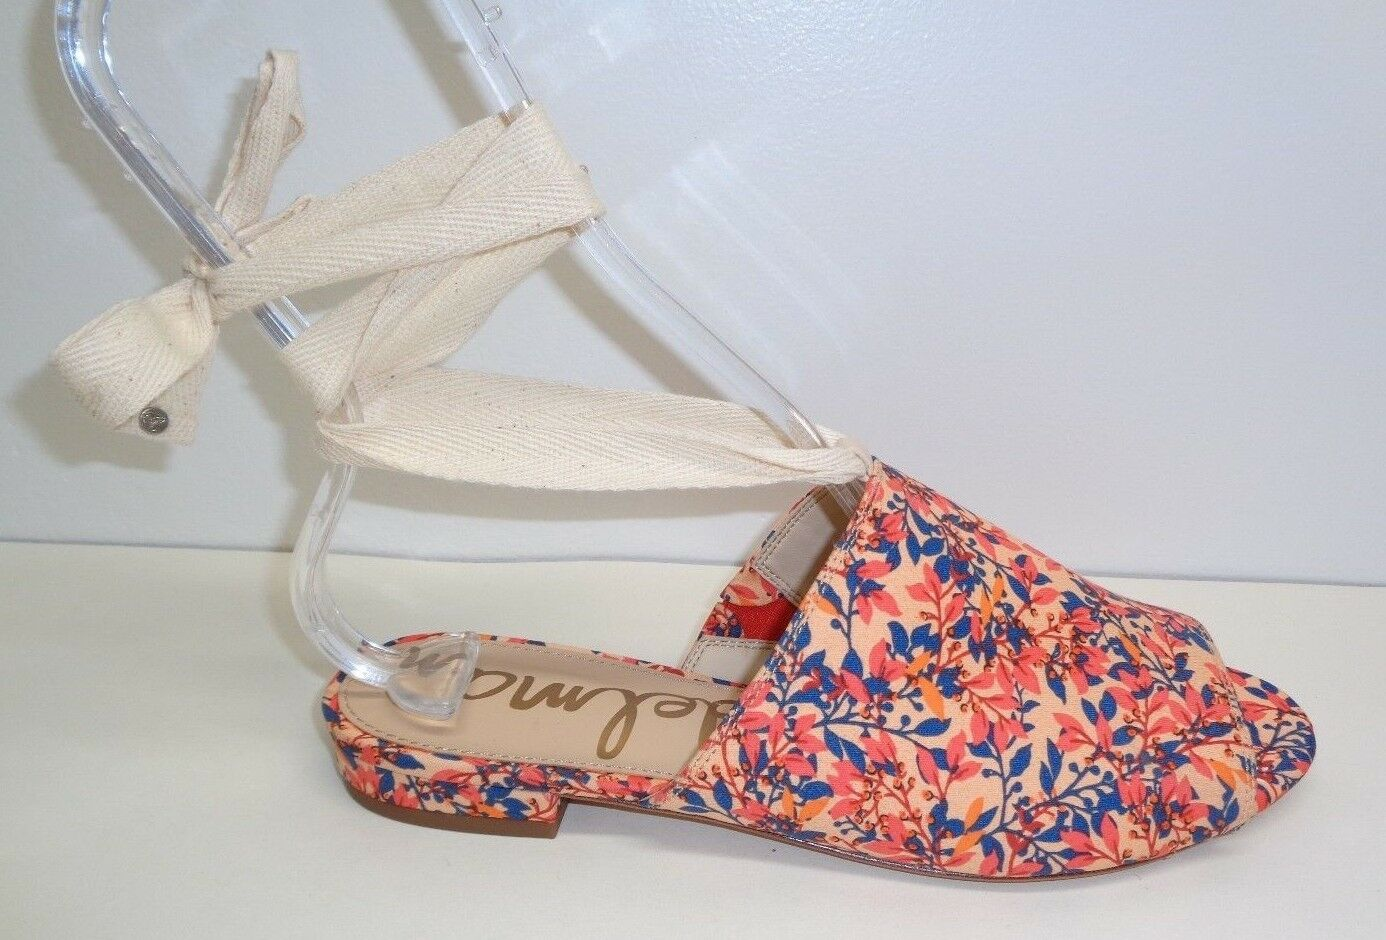 Sam Edelman Größe 6.5 M TAI Coral Fabric Ankle Wrap Sandales NEU Damenschuhe Schuhes